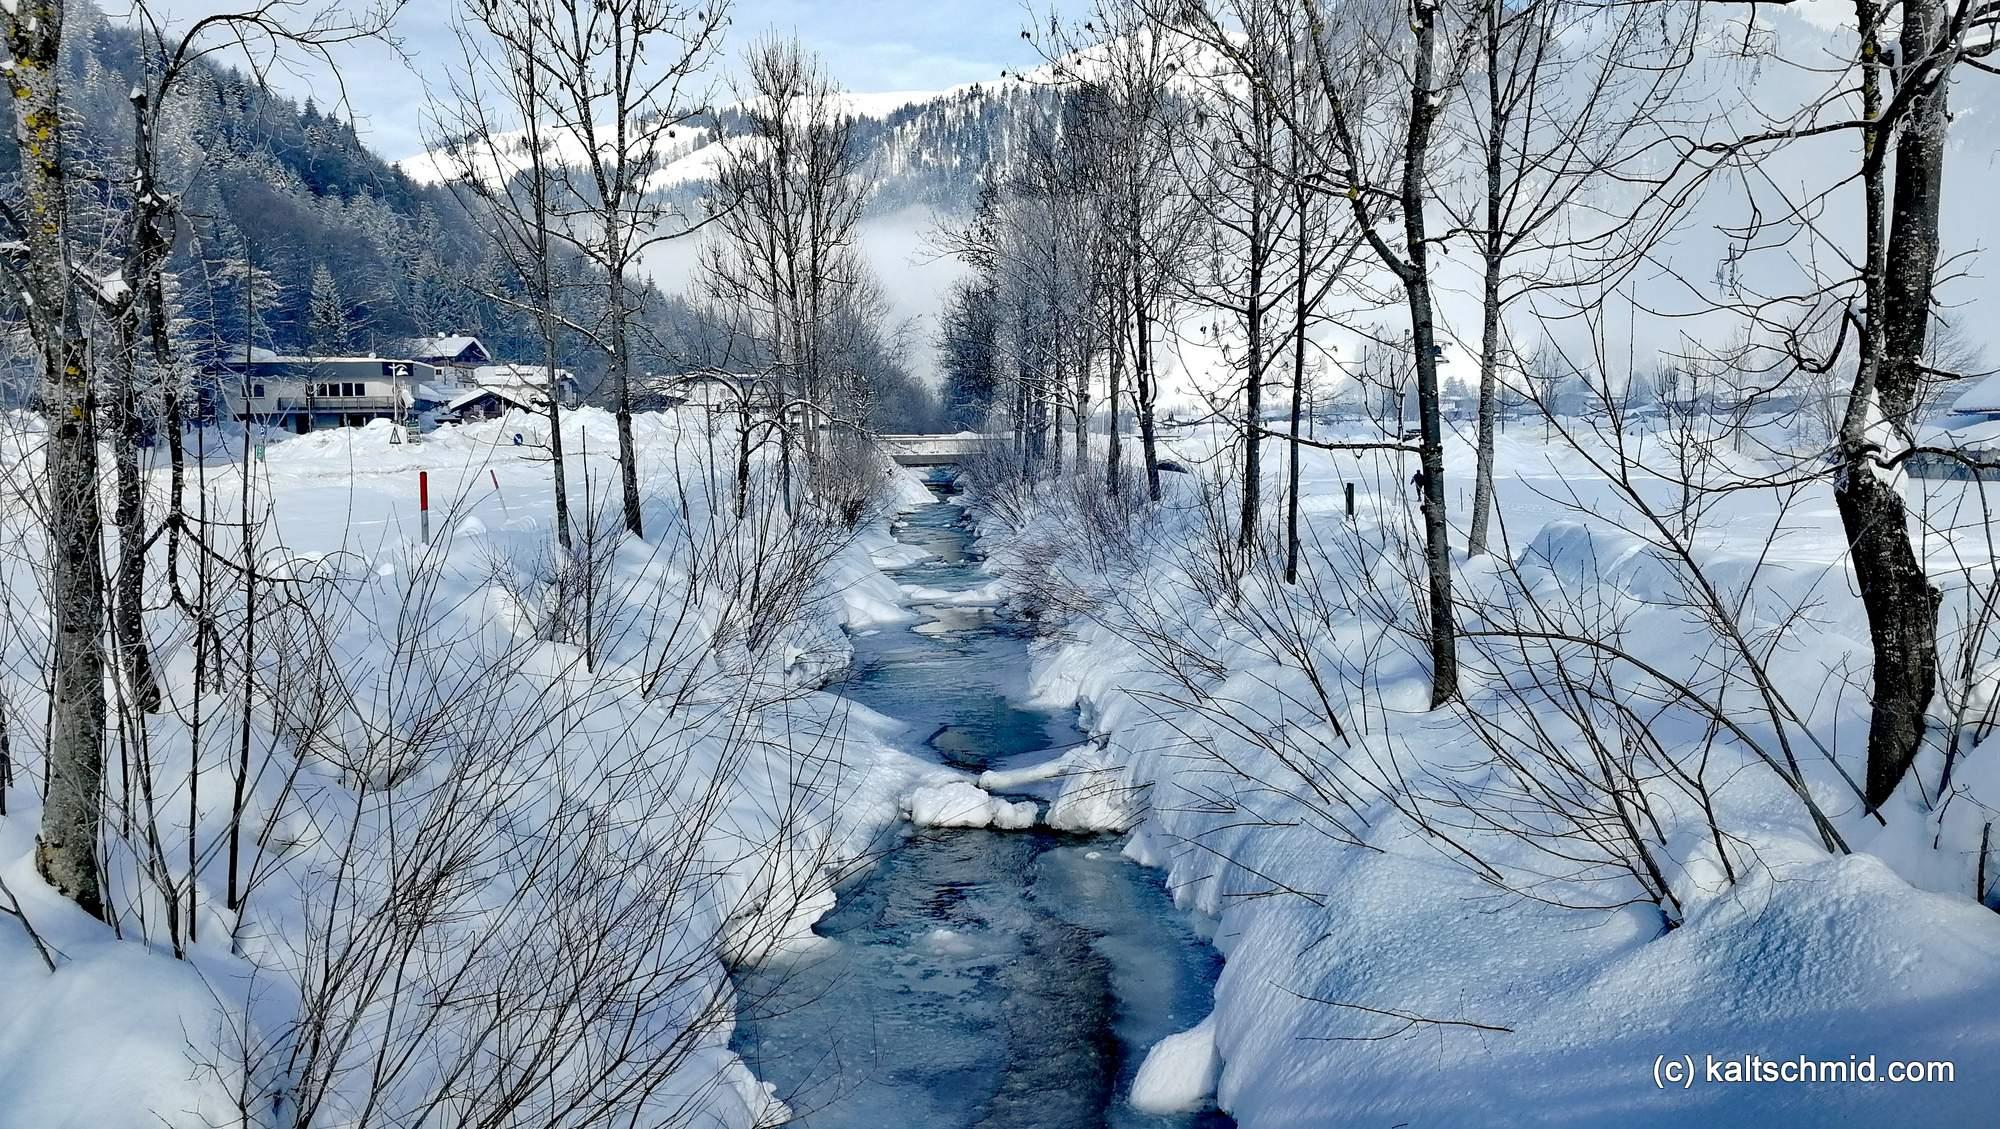 Winterurlaub im Kaiserwinklrwinkl (2)